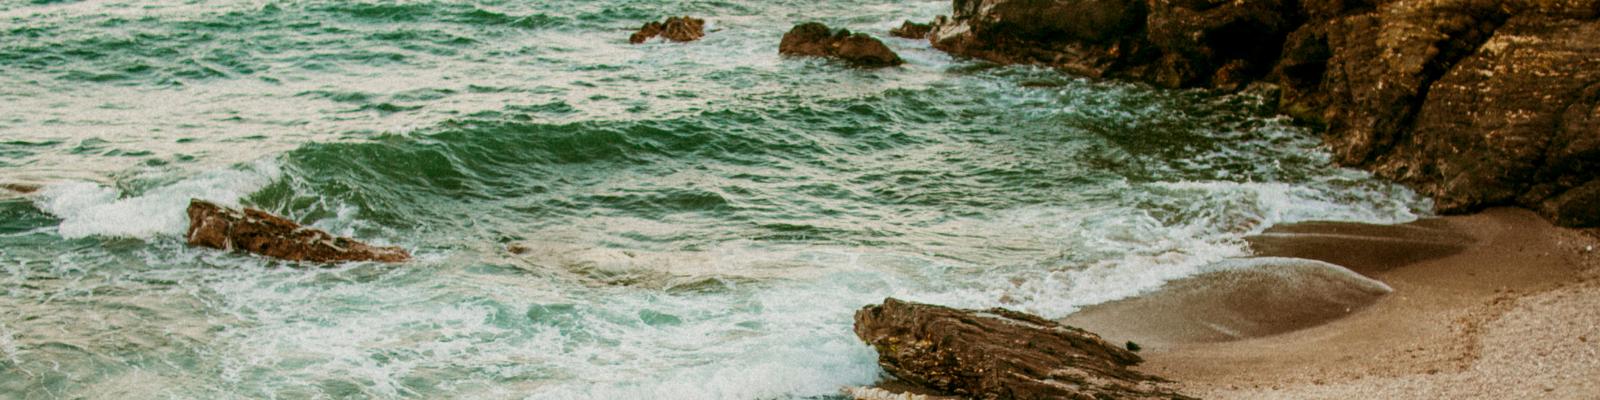 10-minute meditation to reframe stress